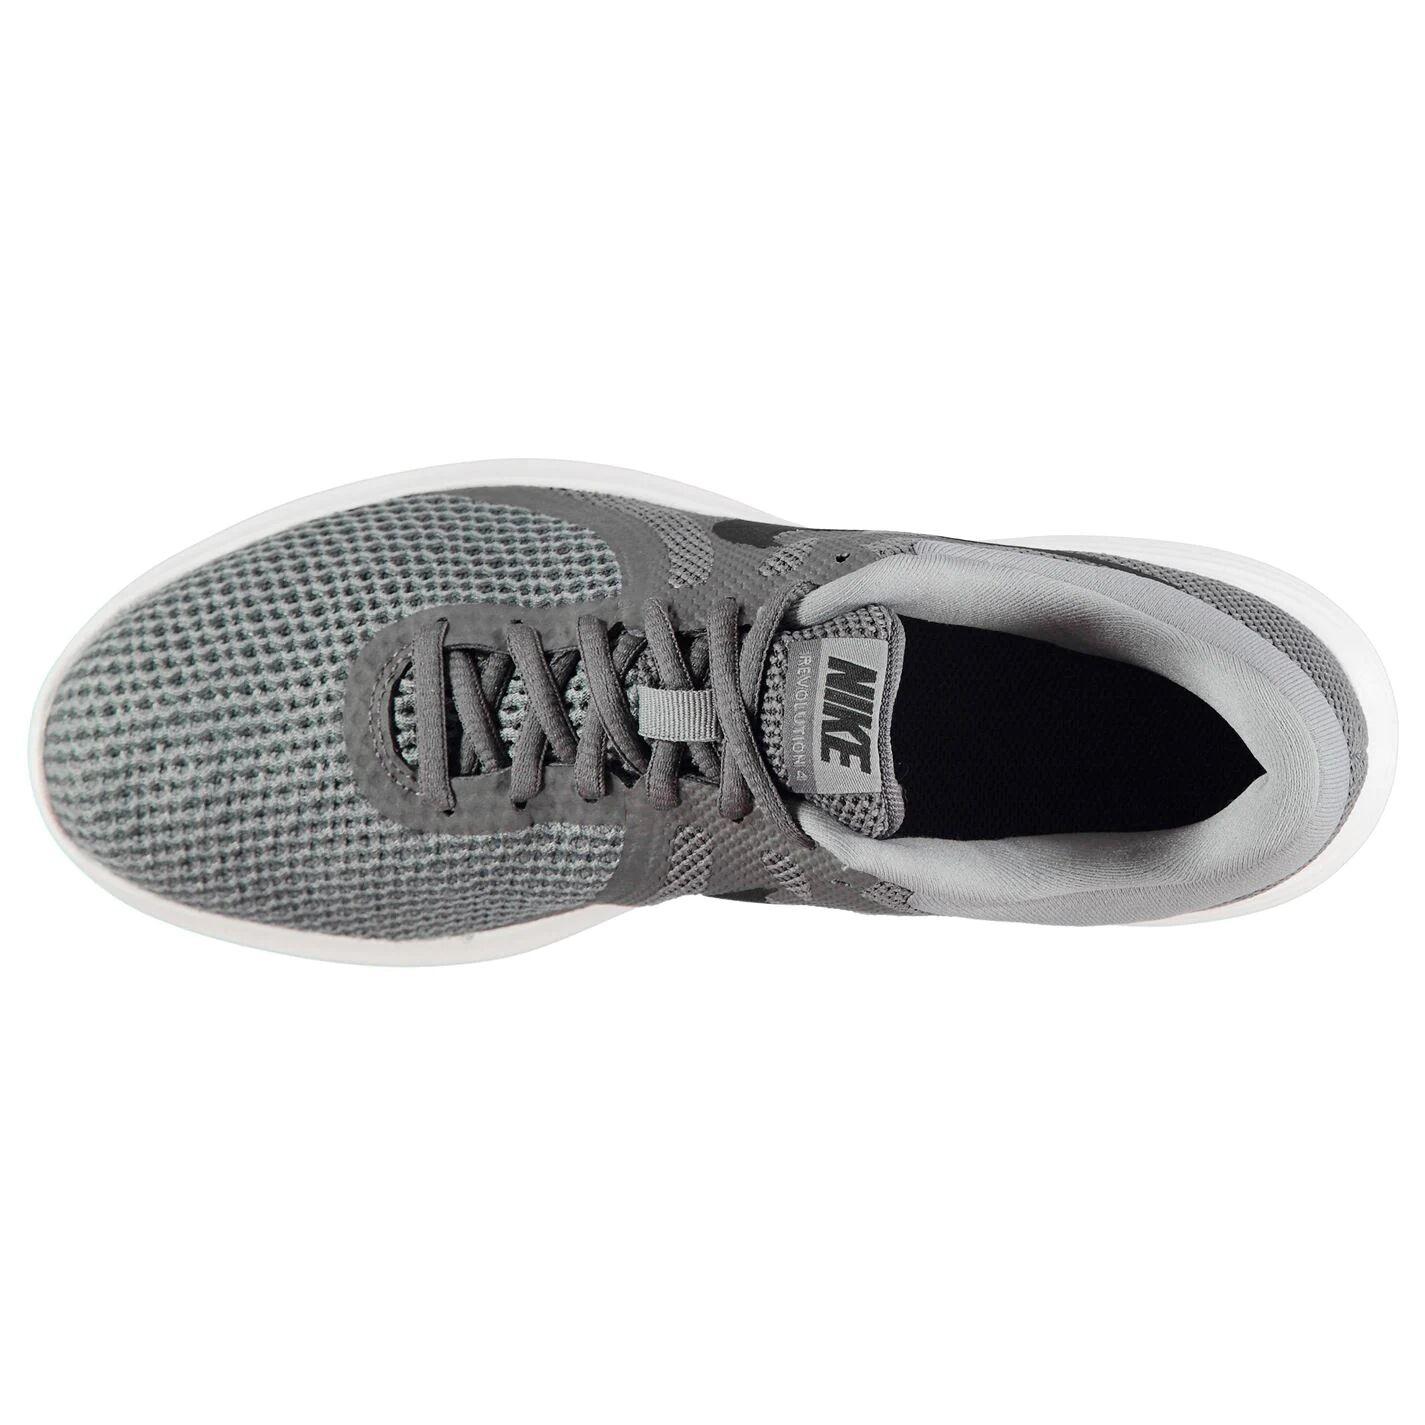 c61ea9c166ff Nike Revolution 4 Mens Trainers (12126390 0) - Sports.mymall.bg